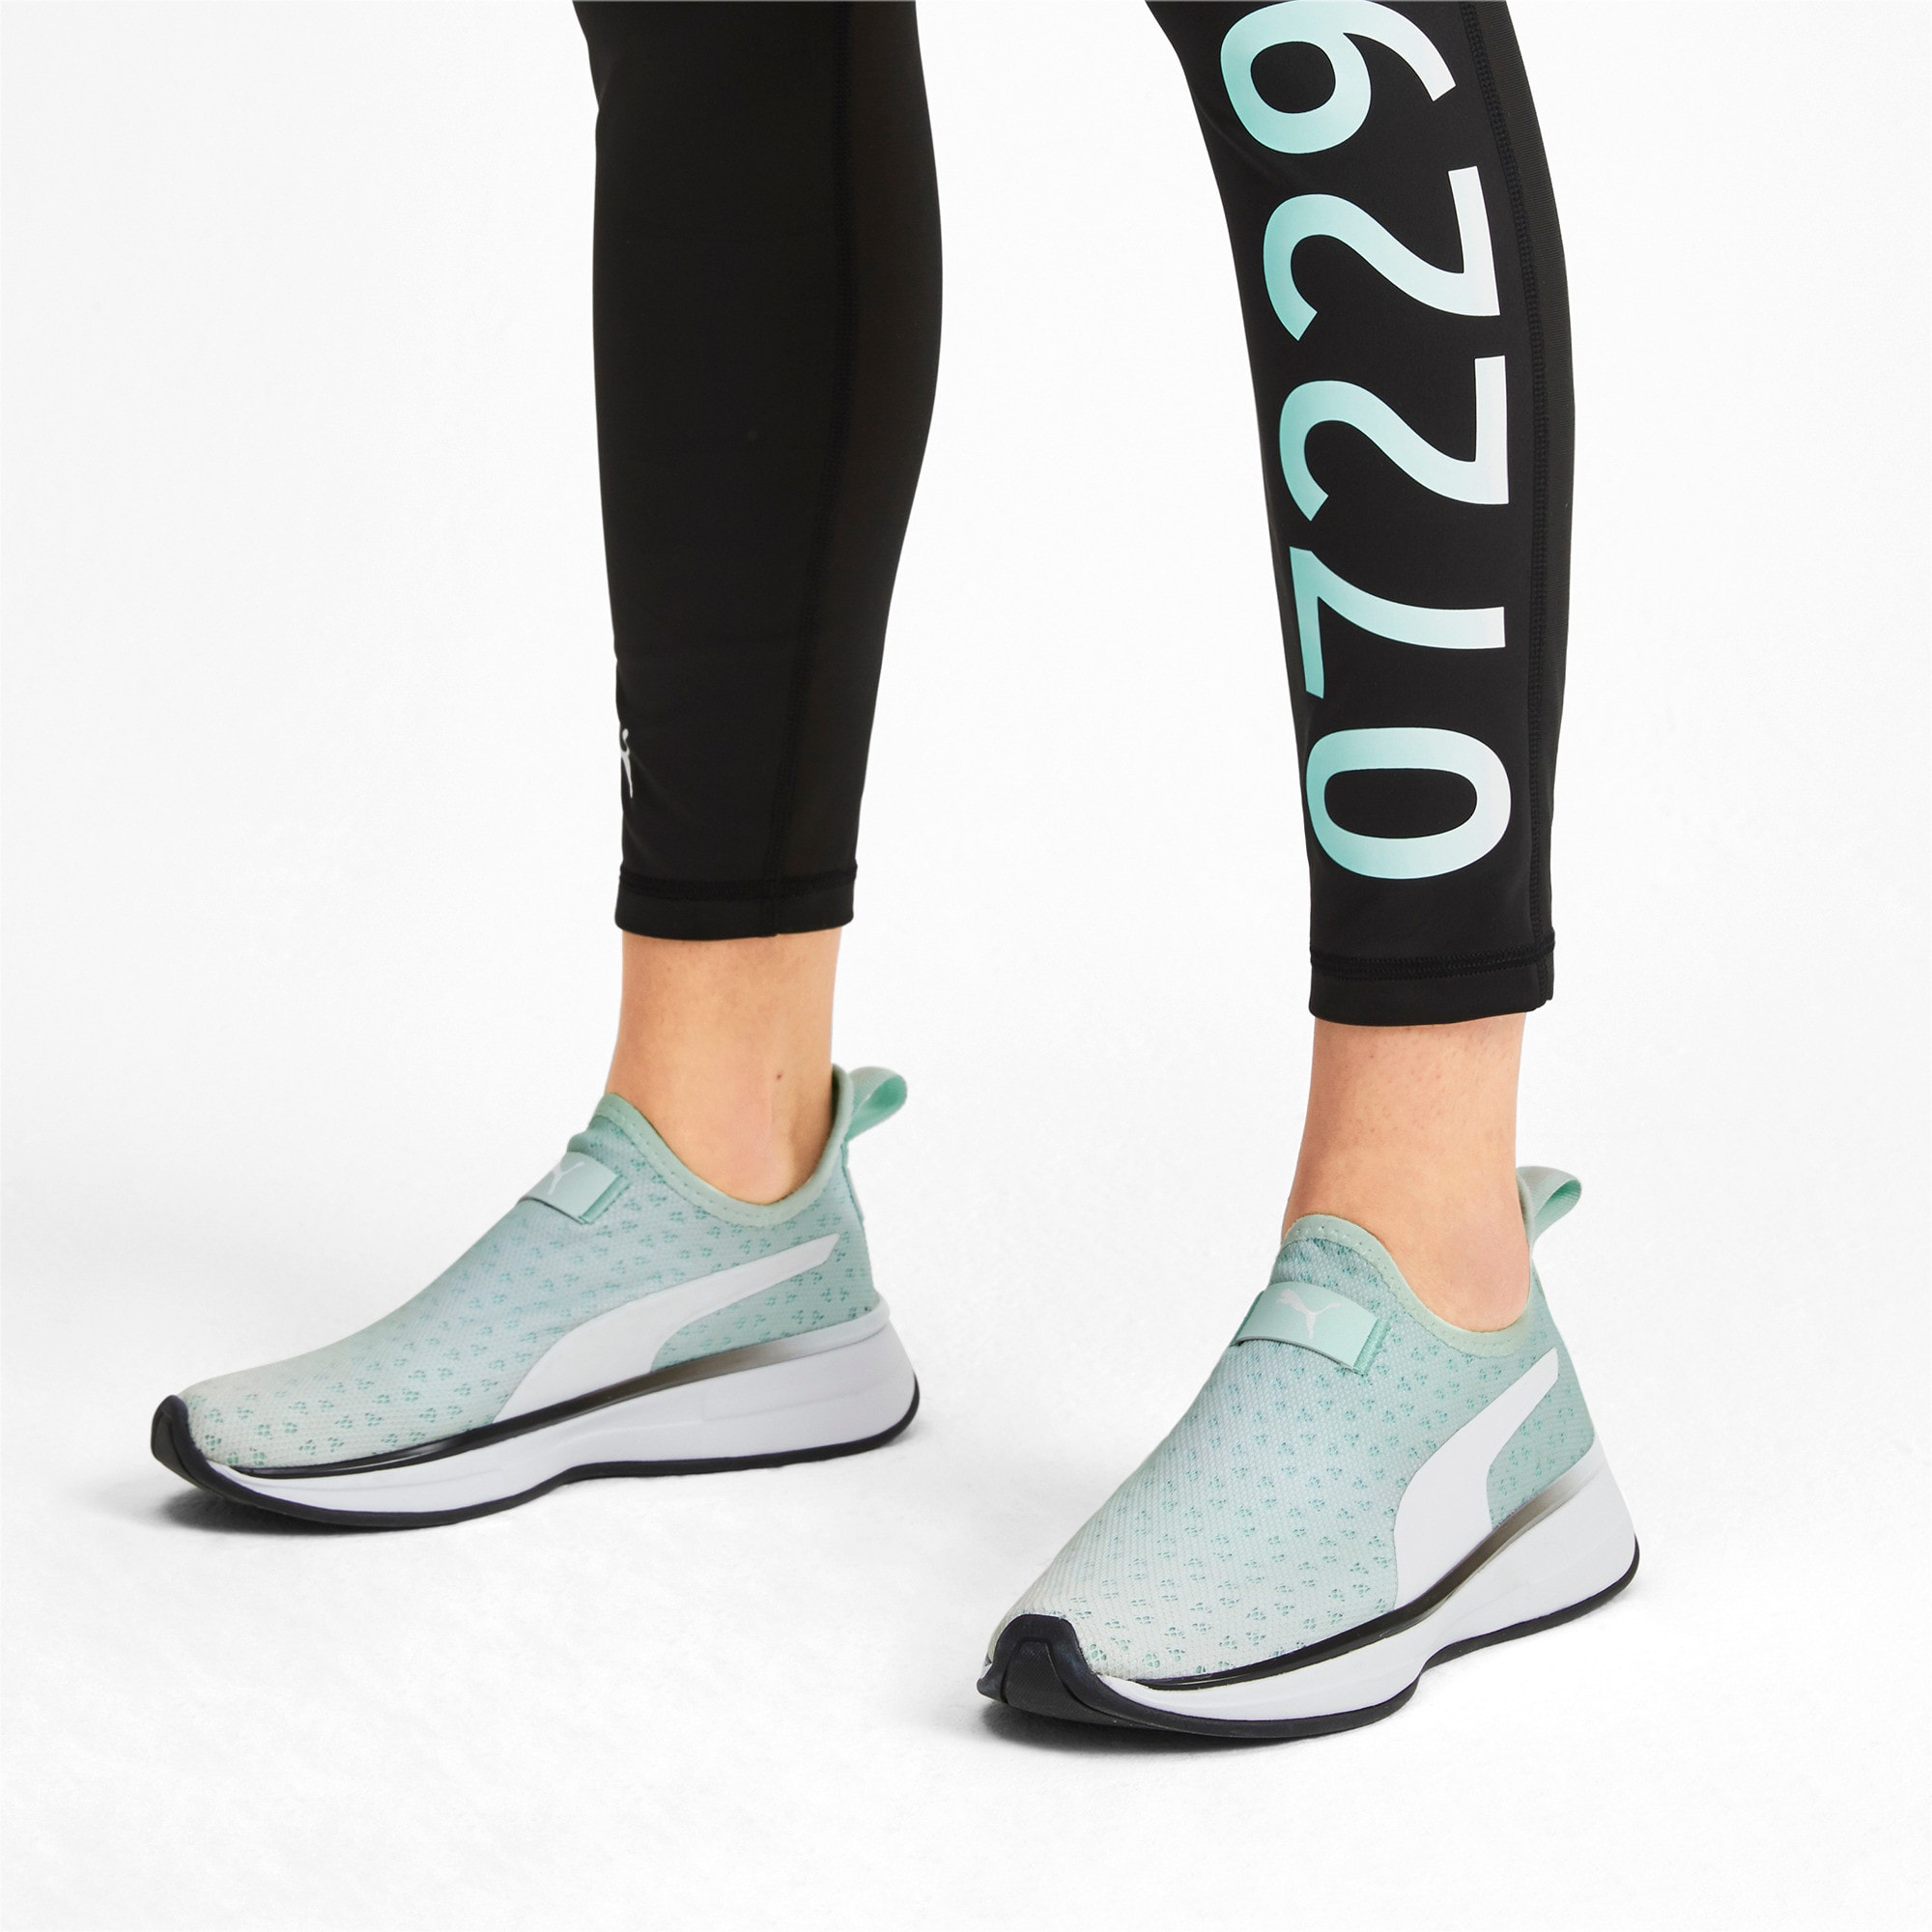 Thumbnail 2 of PUMA x SELENA GOMEZ Slip-On Women's Training Shoes, Fair Aqua-Puma Black, medium